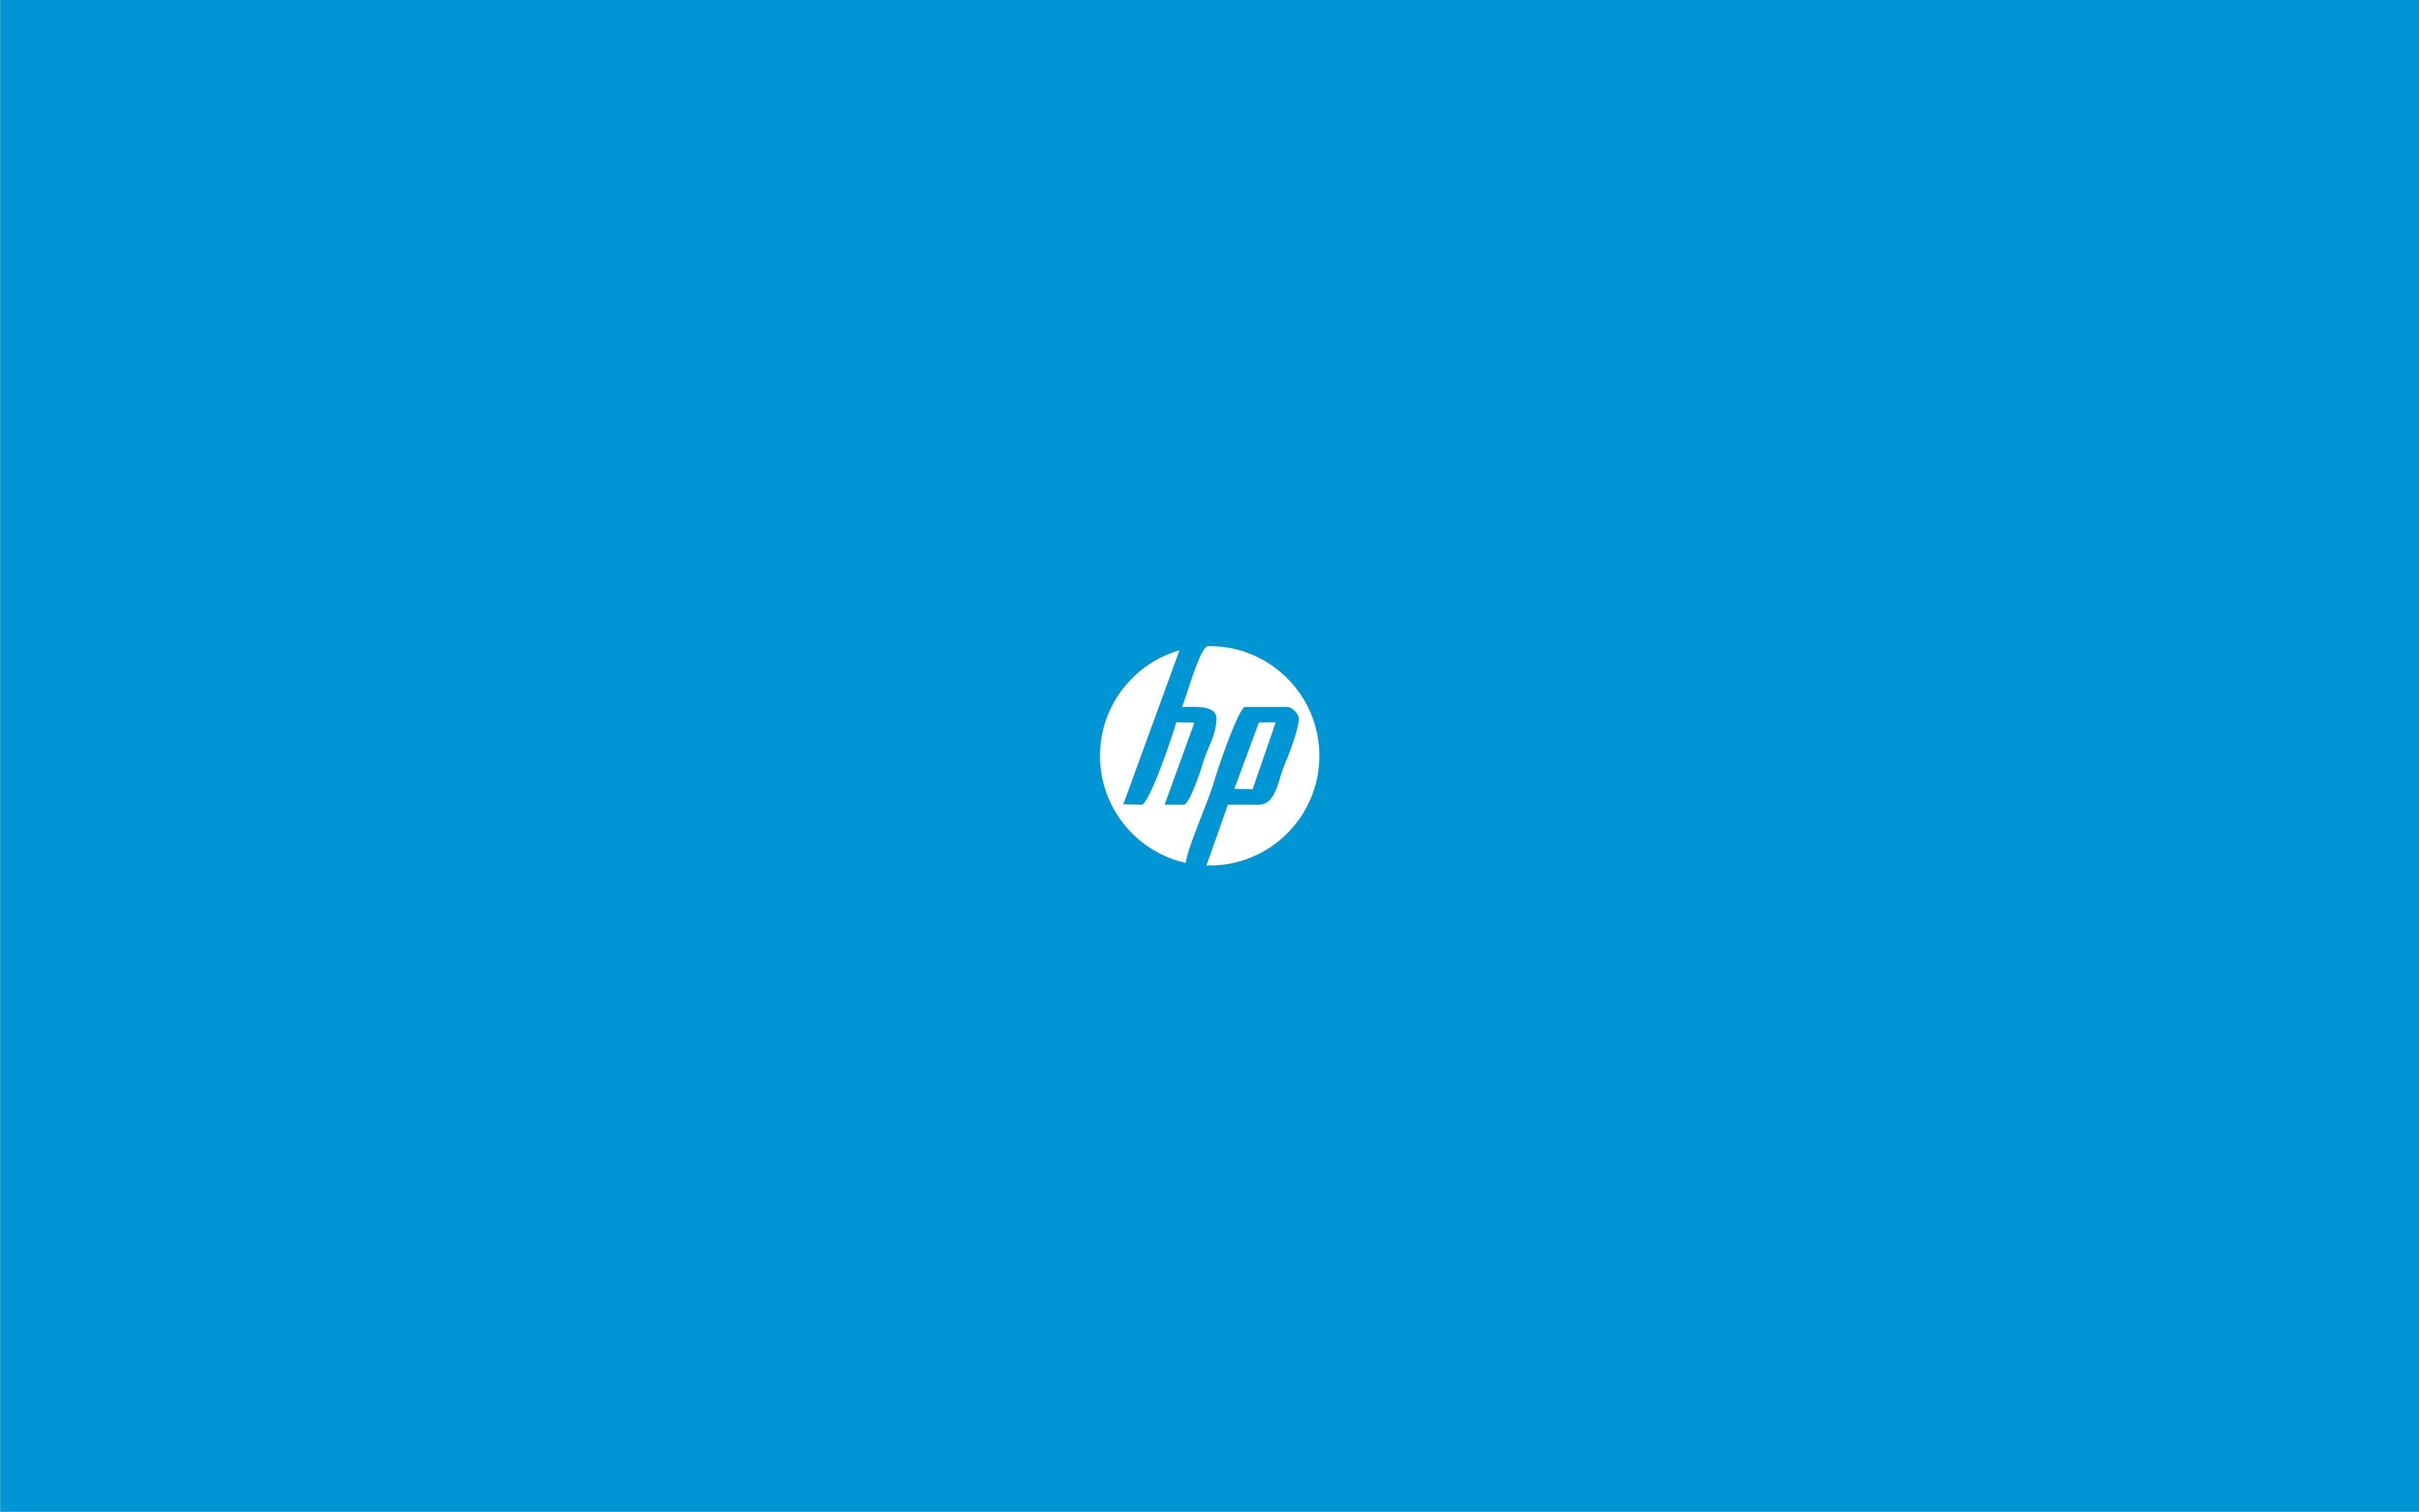 Hp Logo Wallpaper Logo Office Emblem Hewlett Packard Copier Photocopying 5k Wallpaper Hdwallpaper Hp Logo Hewlett Packard Logo Widescreen Wallpaper